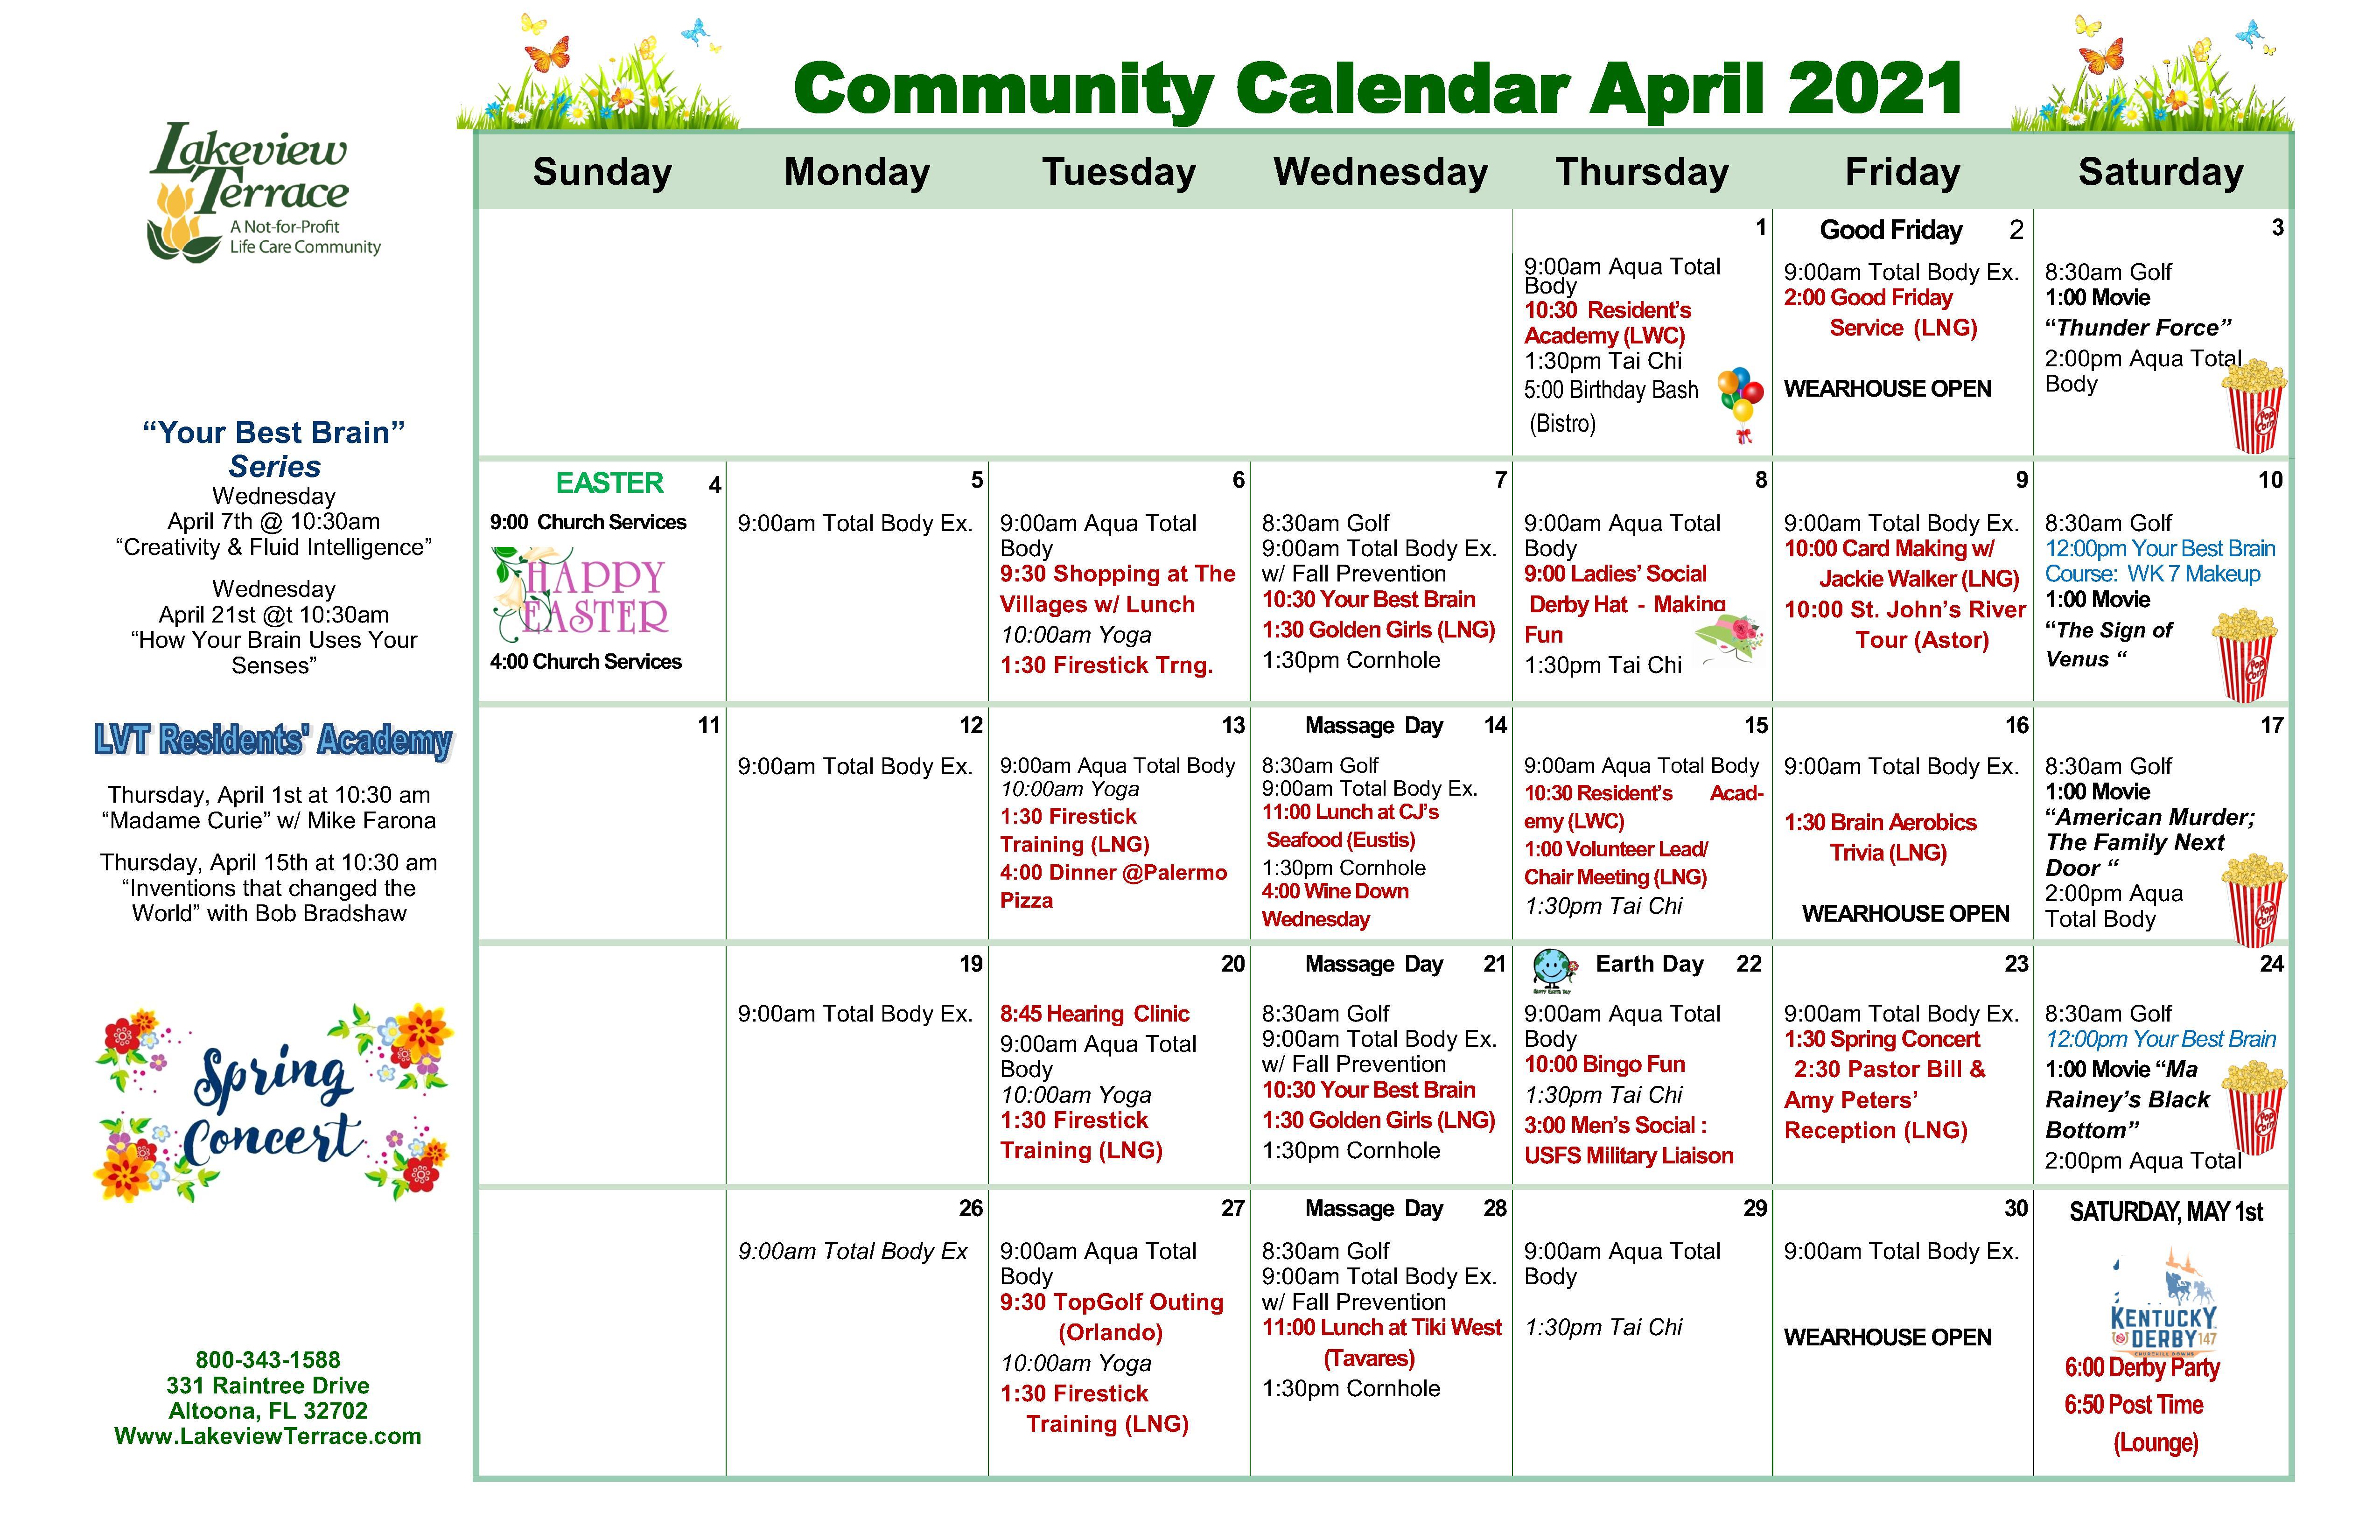 April Community Calendar 2021